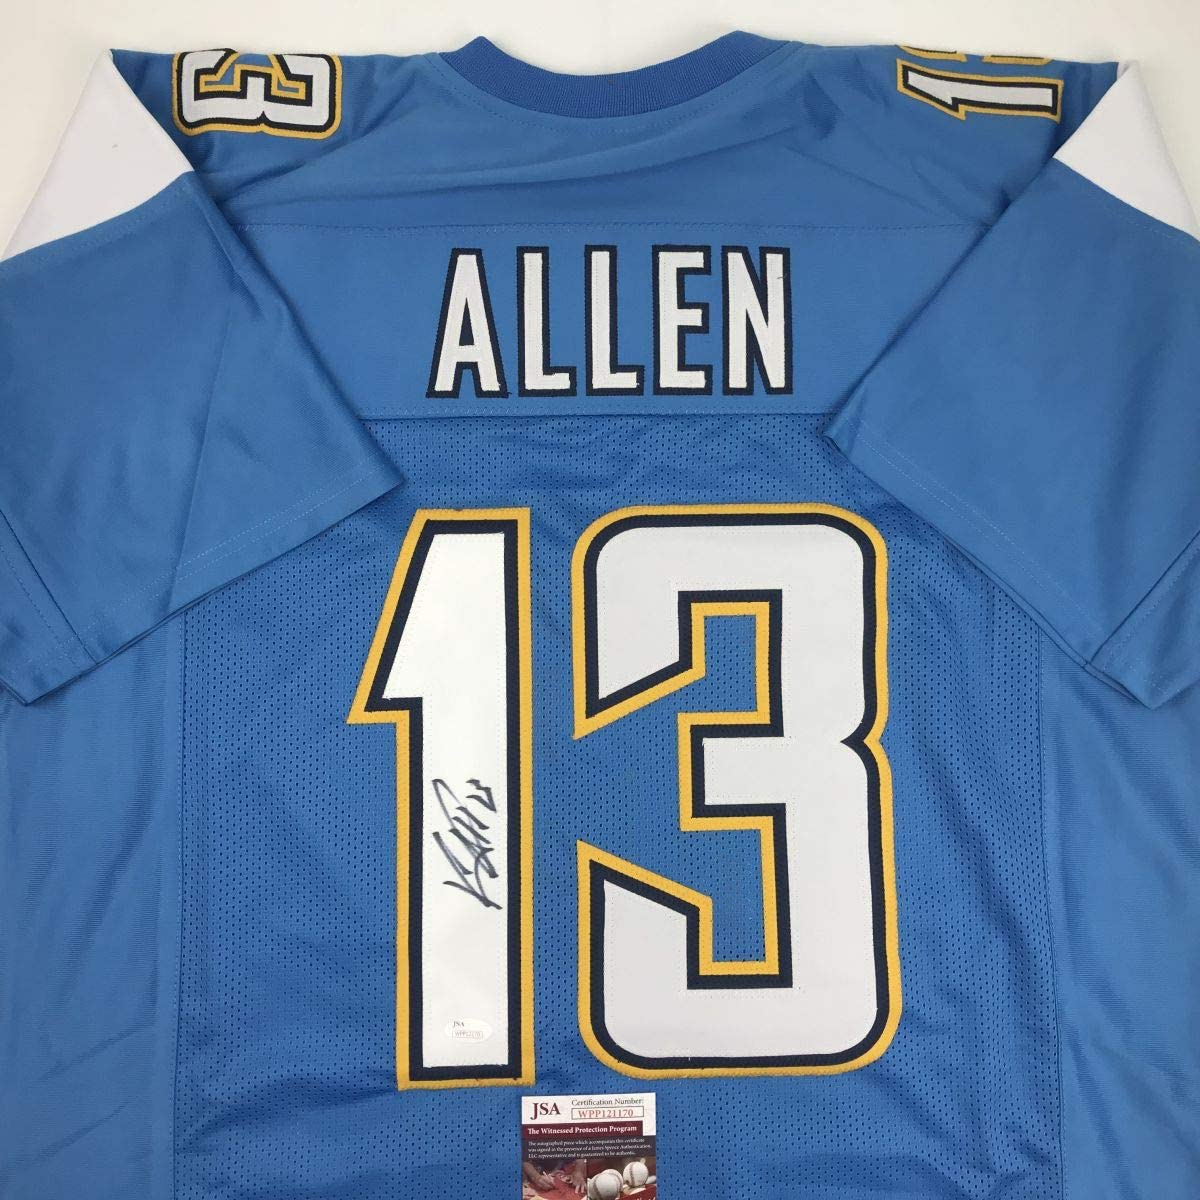 Autographed Signed Keenan Allen Los Angeles LA Blue Footb Indefinitely Very popular Powder